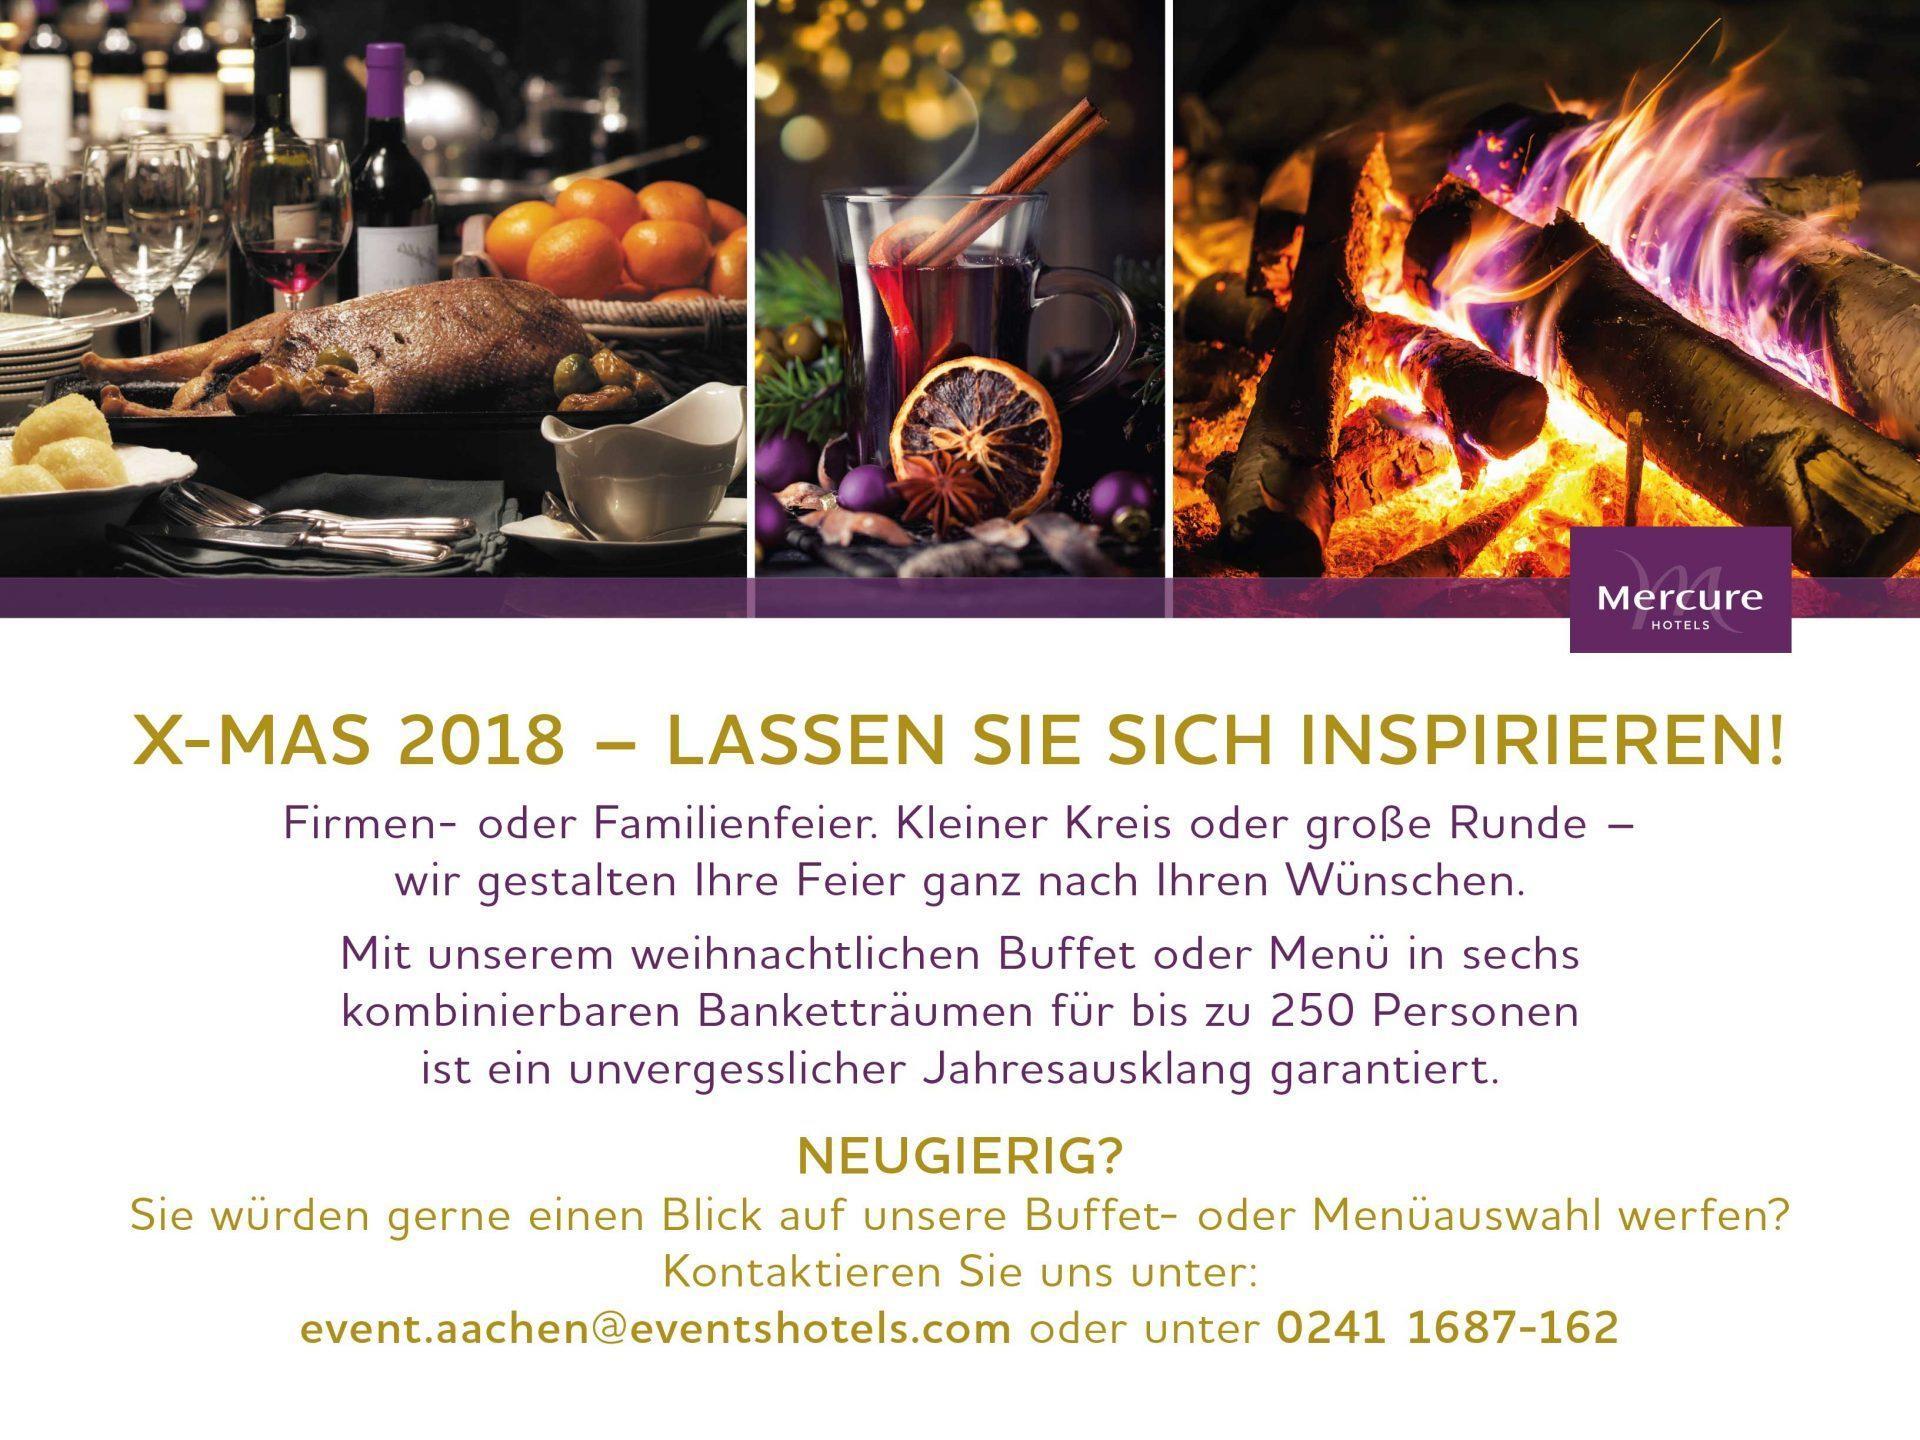 Weihnachtsfeier in Aachen Flyer - Mercure Aachen Europaplatz